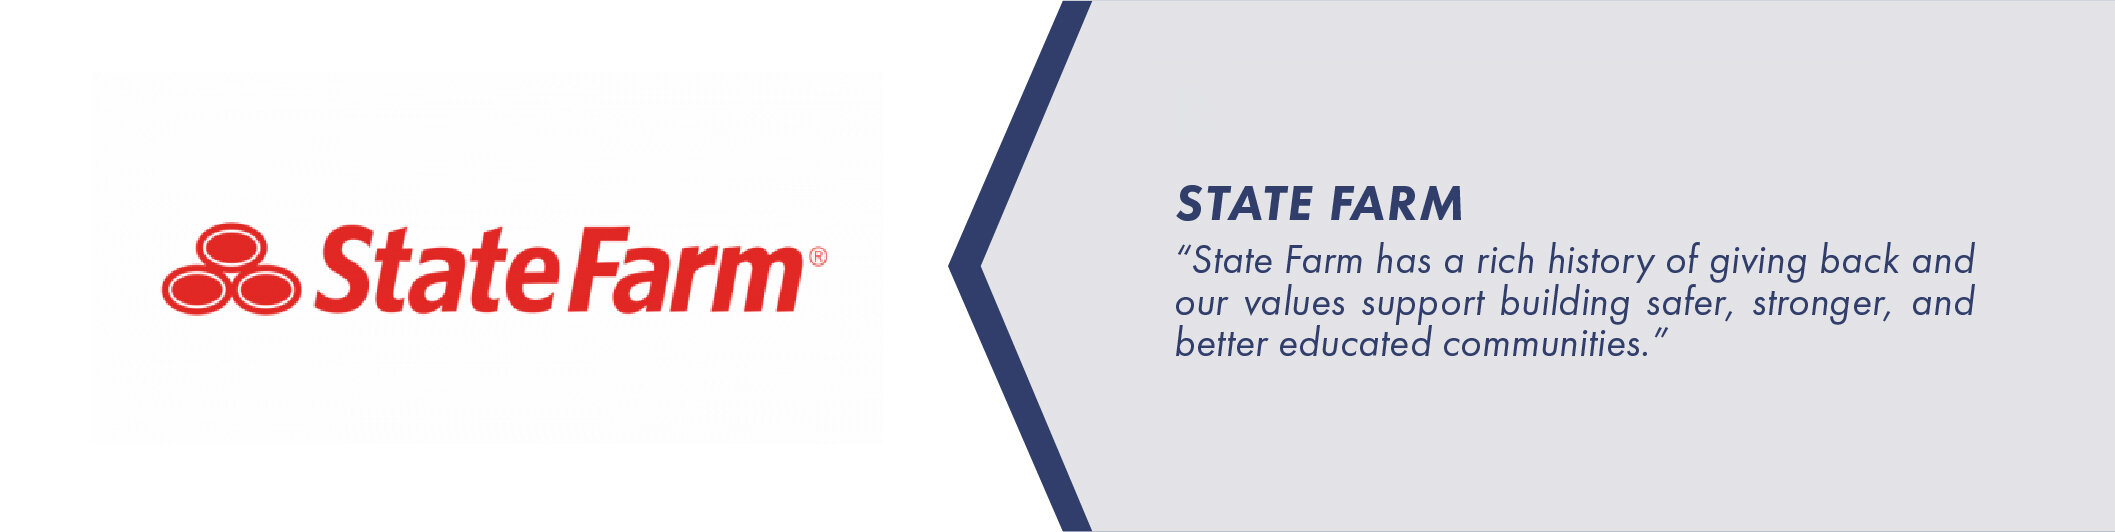 State+Farm+Homepage.jpg